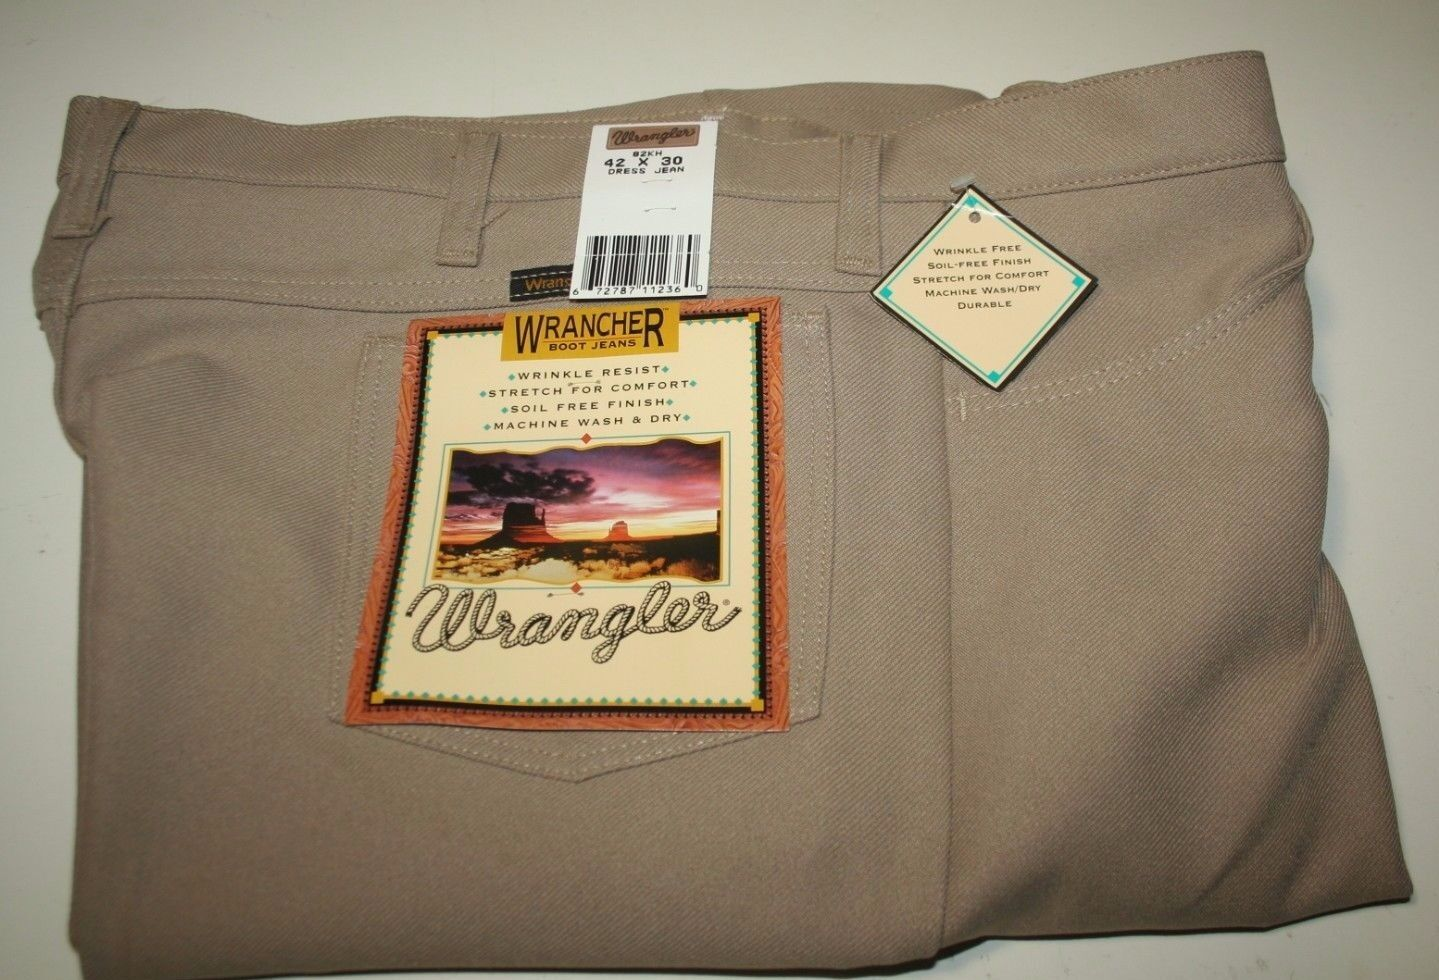 Wrangler Men's Wrancher Dress Pant,Dark Beige,29x32